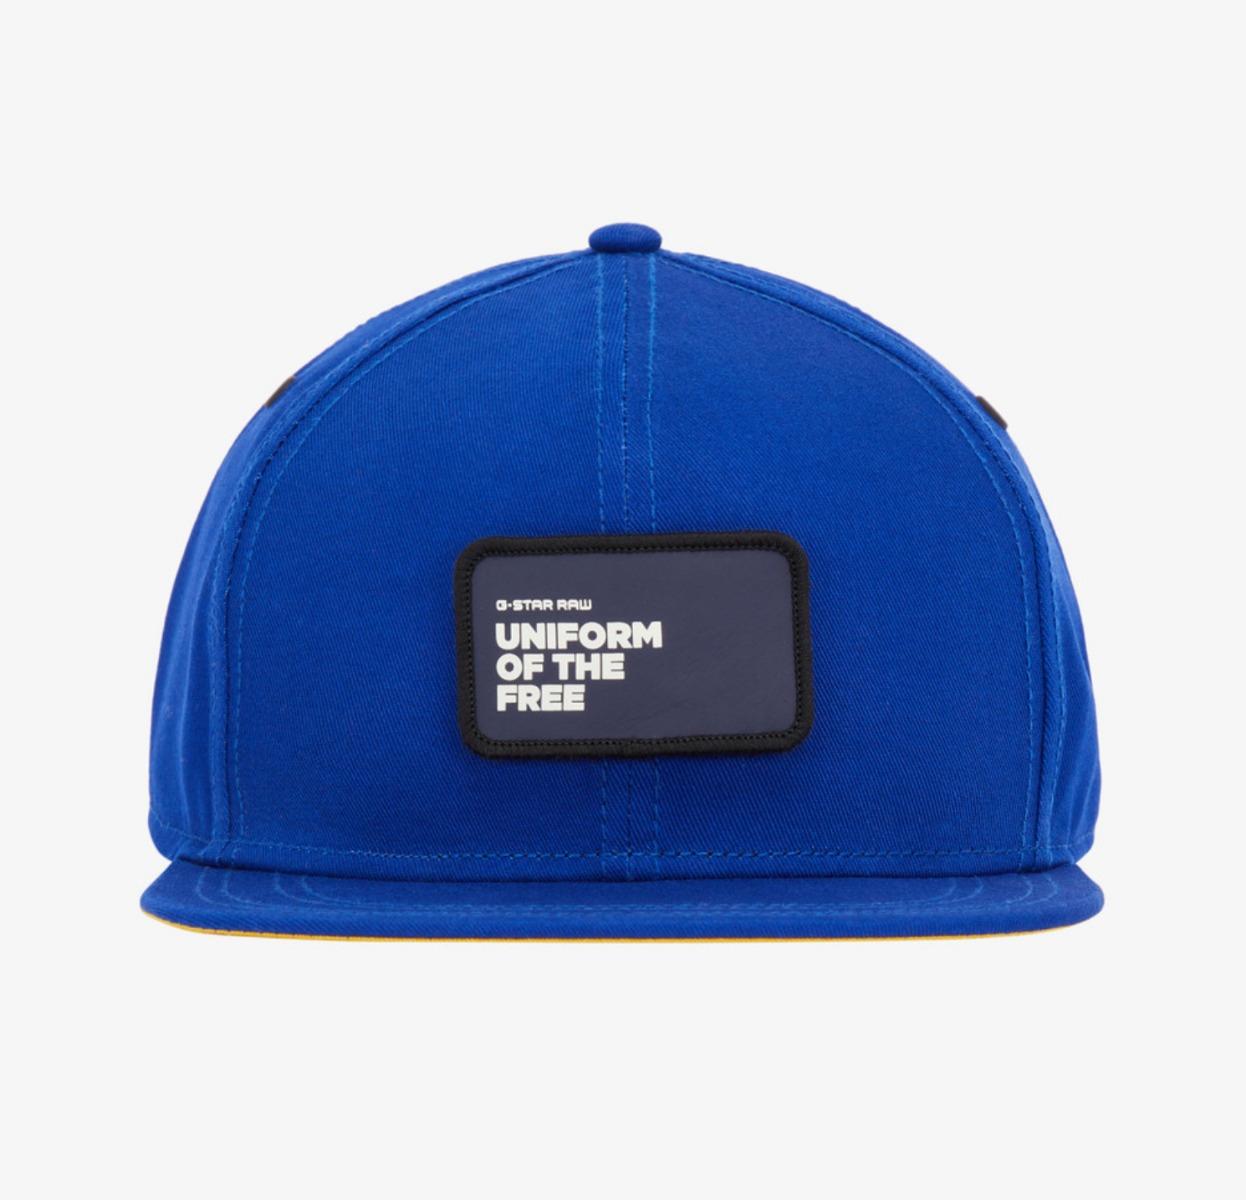 21d29e981003d G-Star RAW Data Snapback Cap Hat in Hudson Blue, BNWT 8719764249465 ...